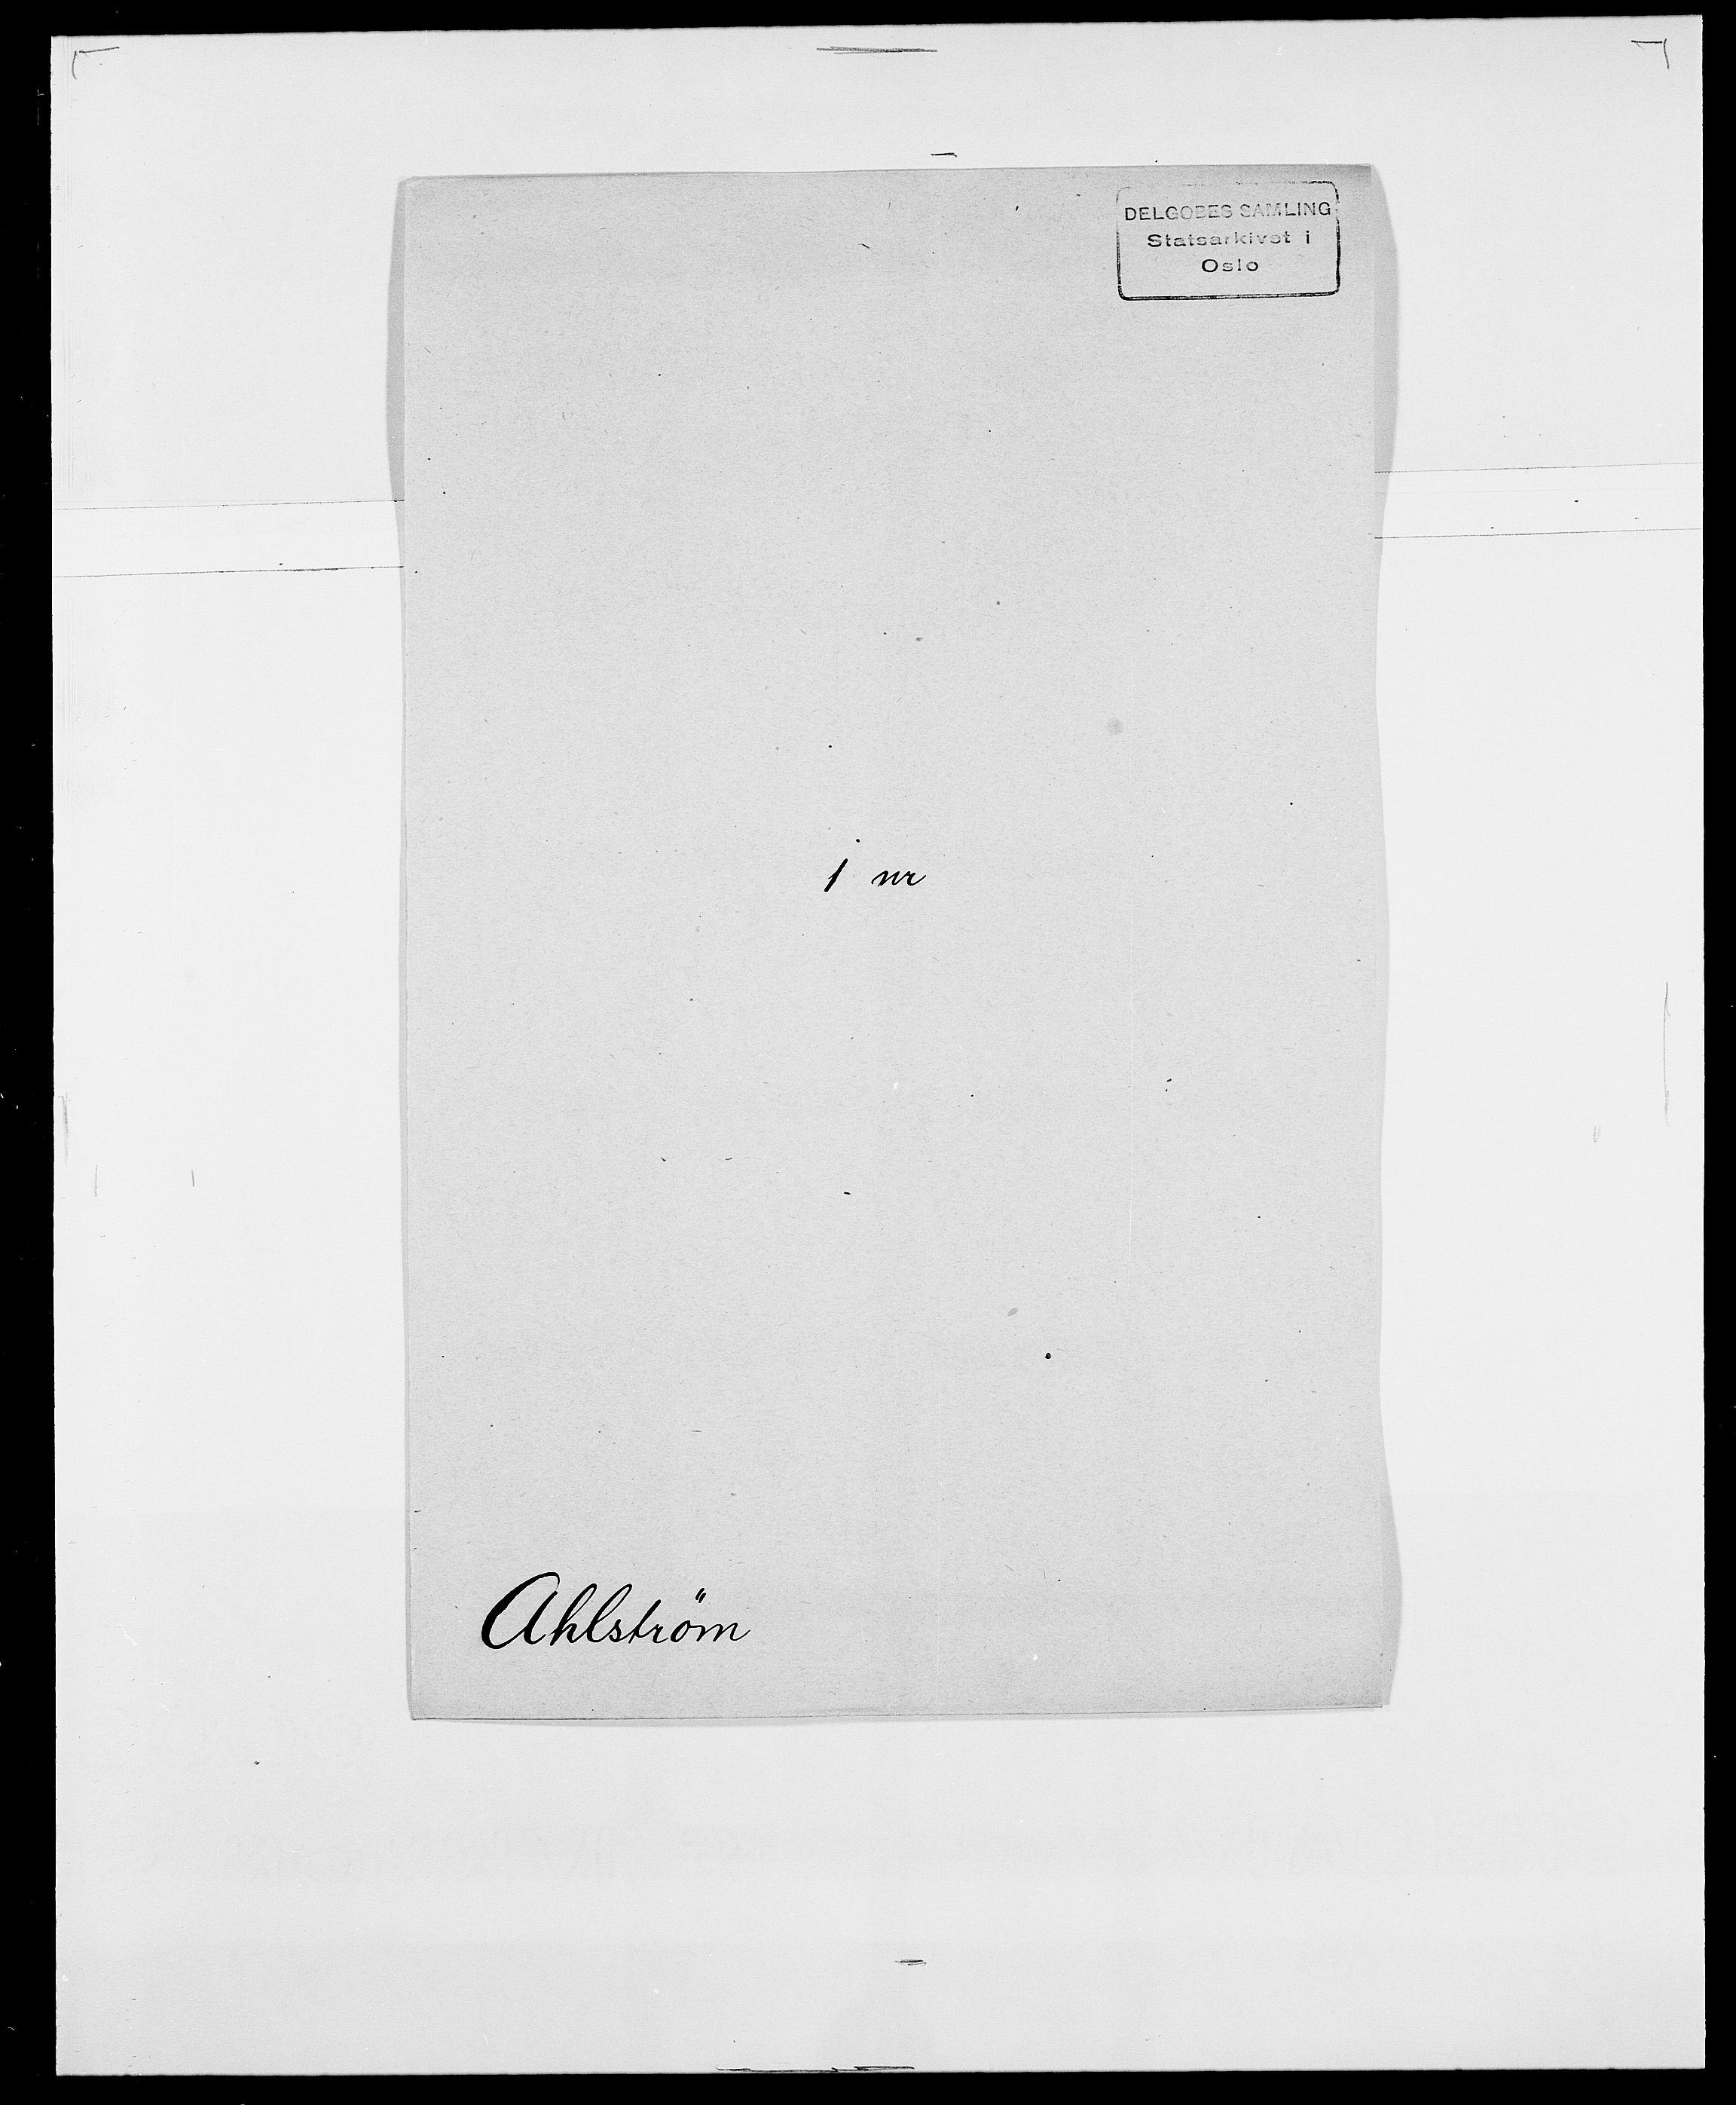 SAO, Delgobe, Charles Antoine - samling, D/Da/L0001: Aabye - Angerman, s. 340